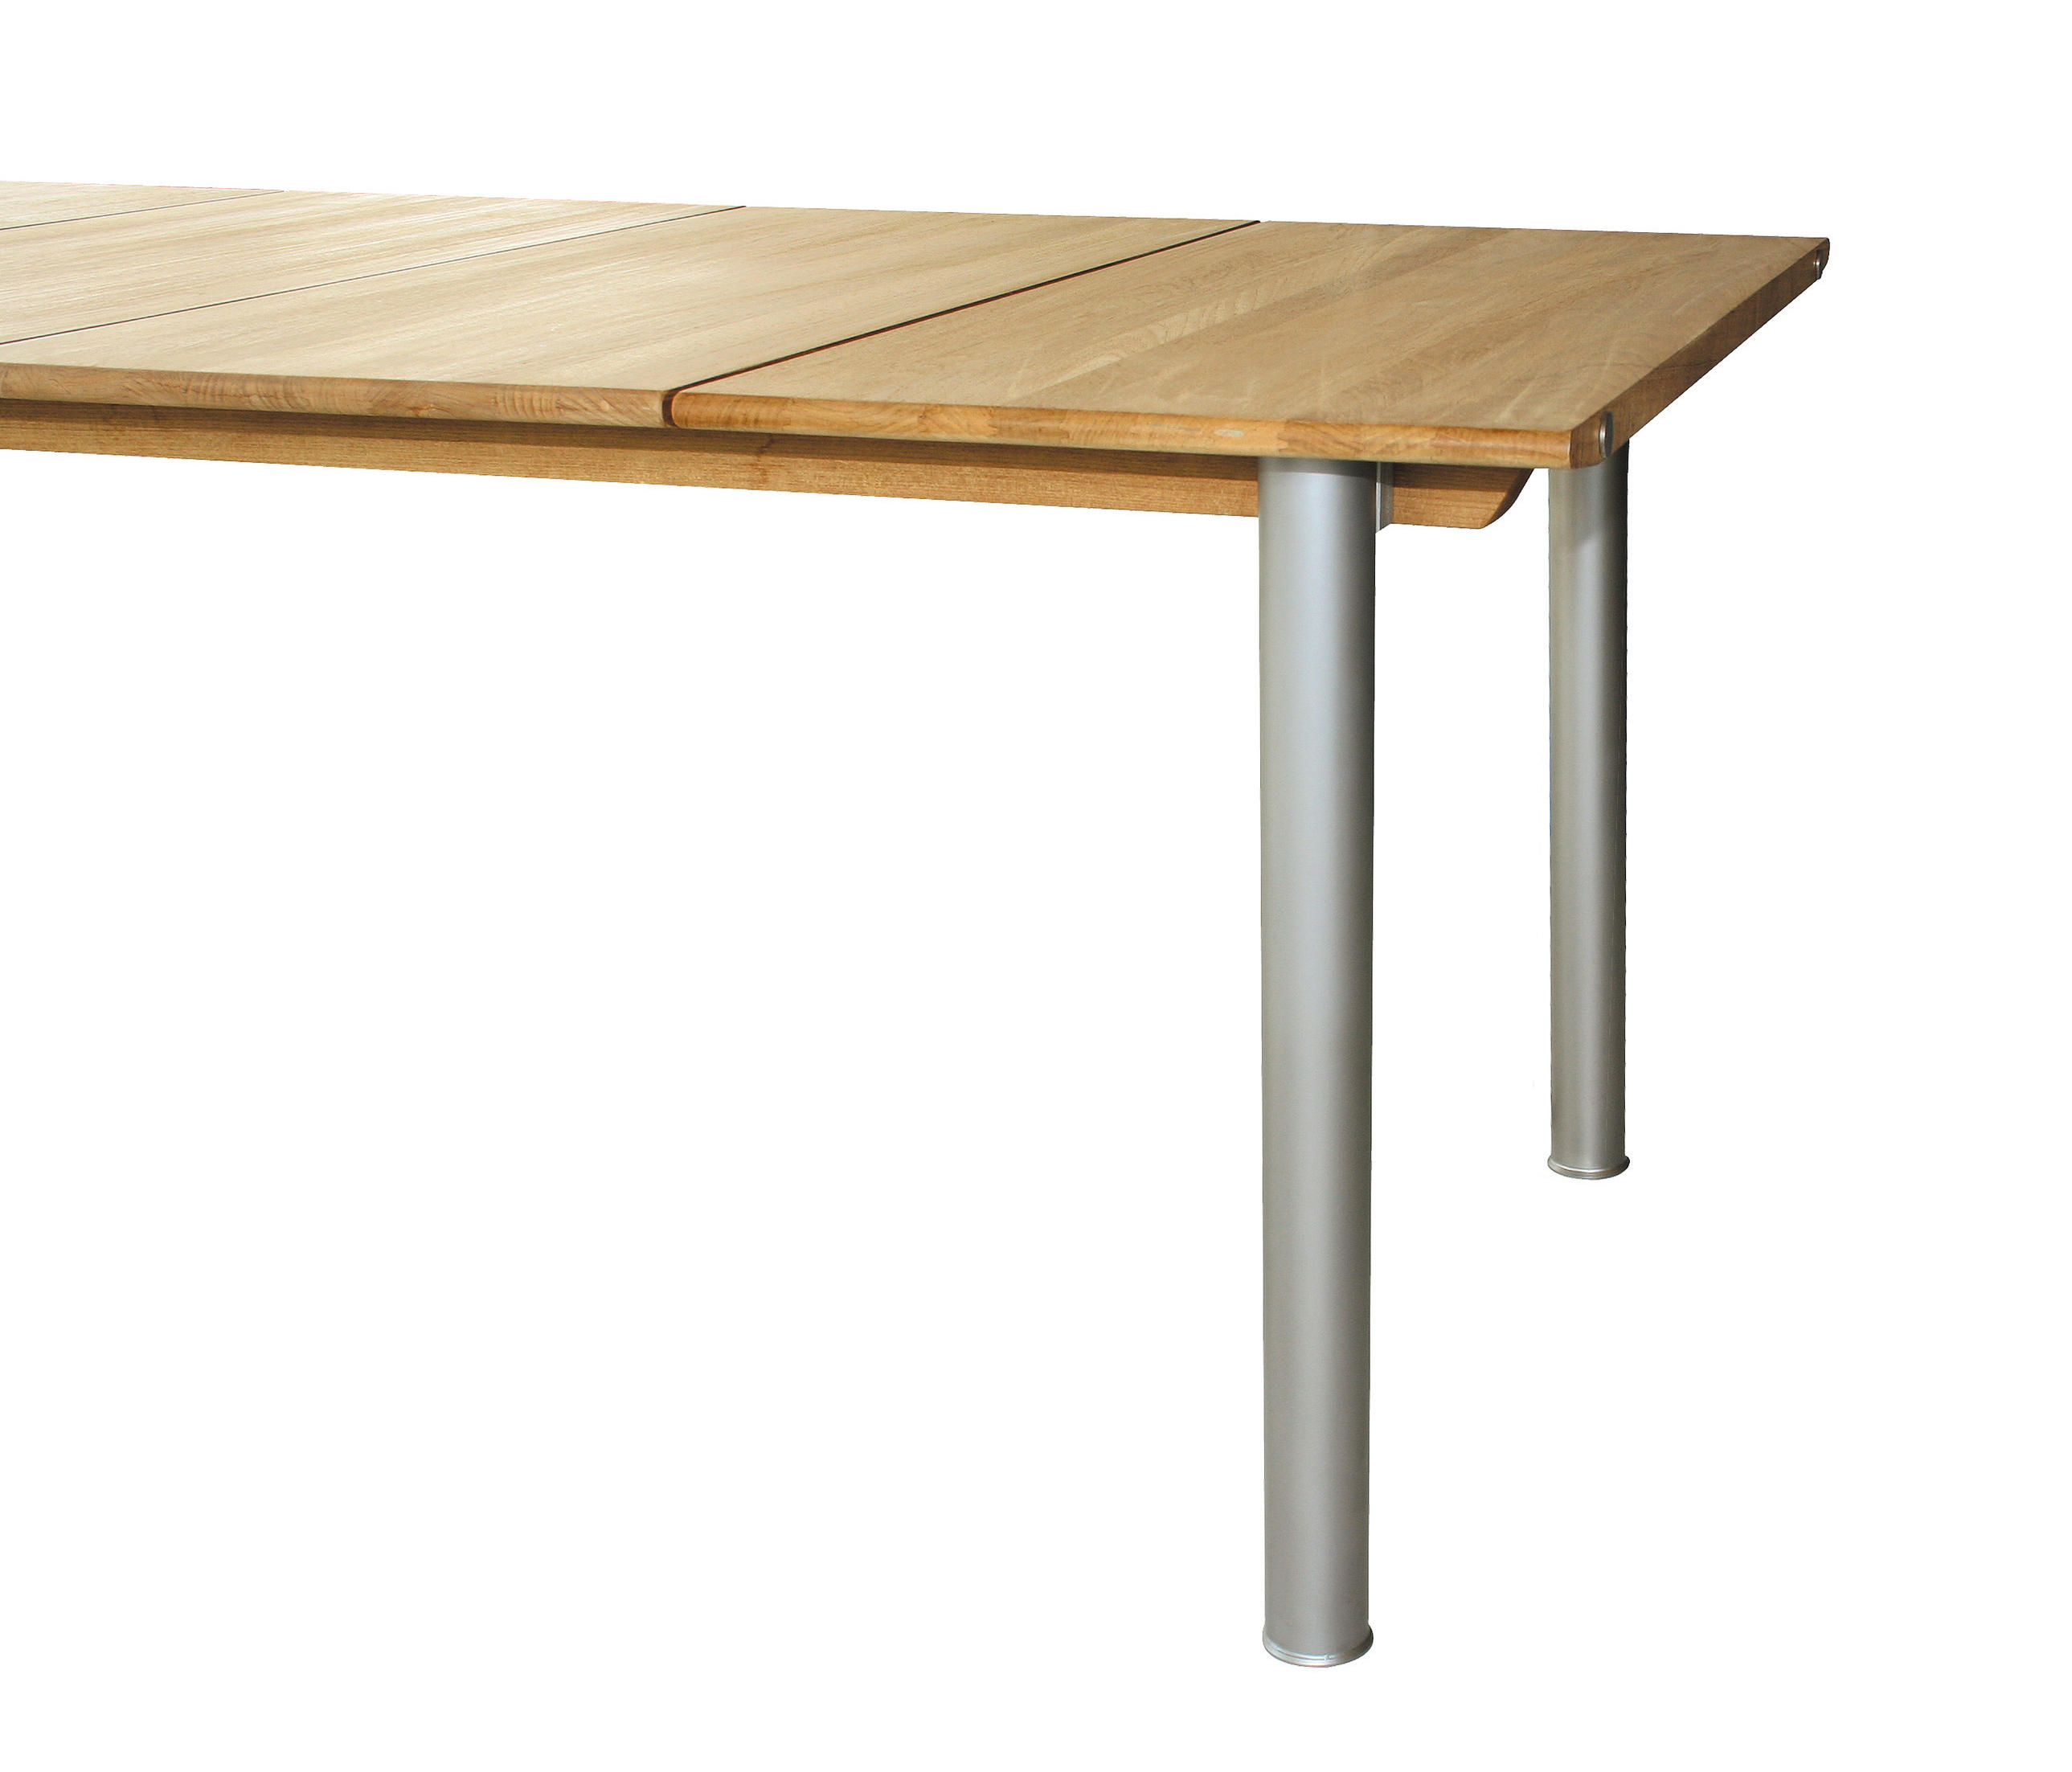 Domido table tavoli pranzo fischer m bel architonic for Produttori tavoli